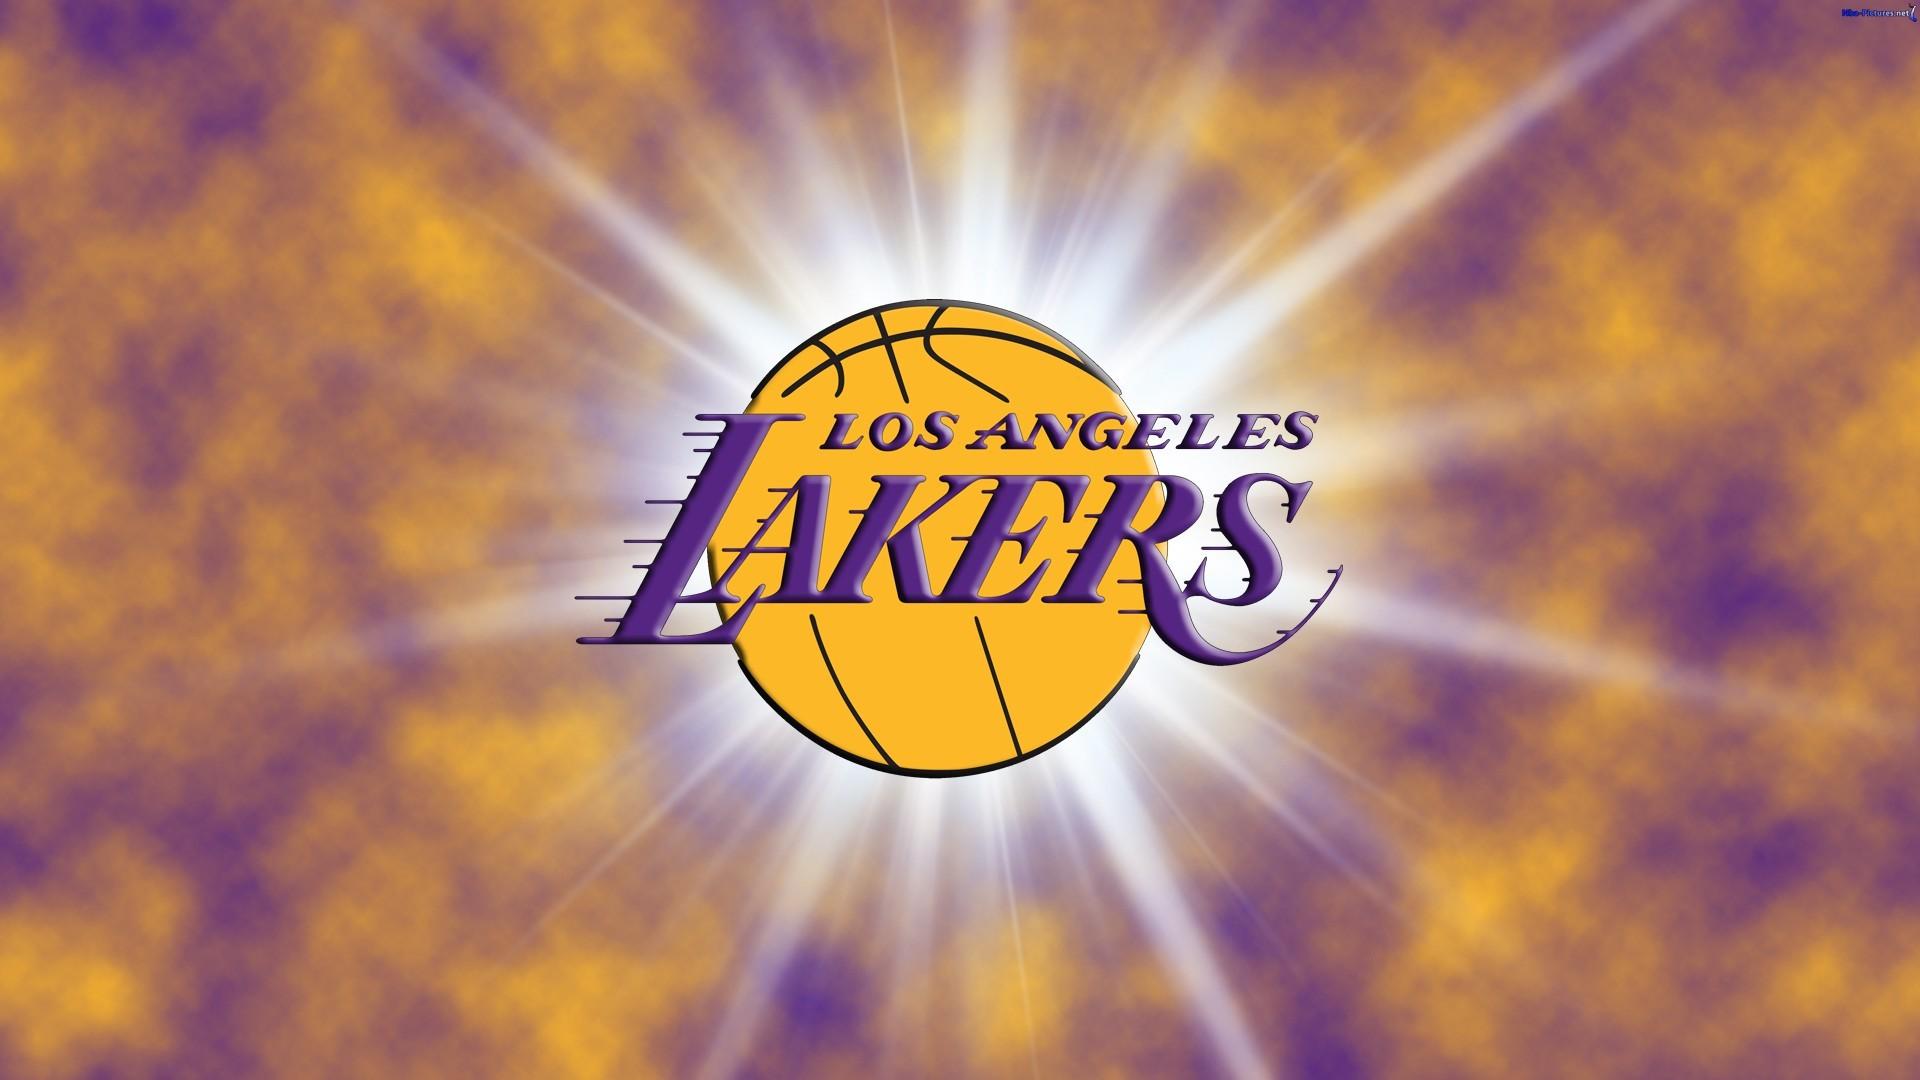 Lakers images background 1920x1080 la laker wallpaper voltagebd Choice Image